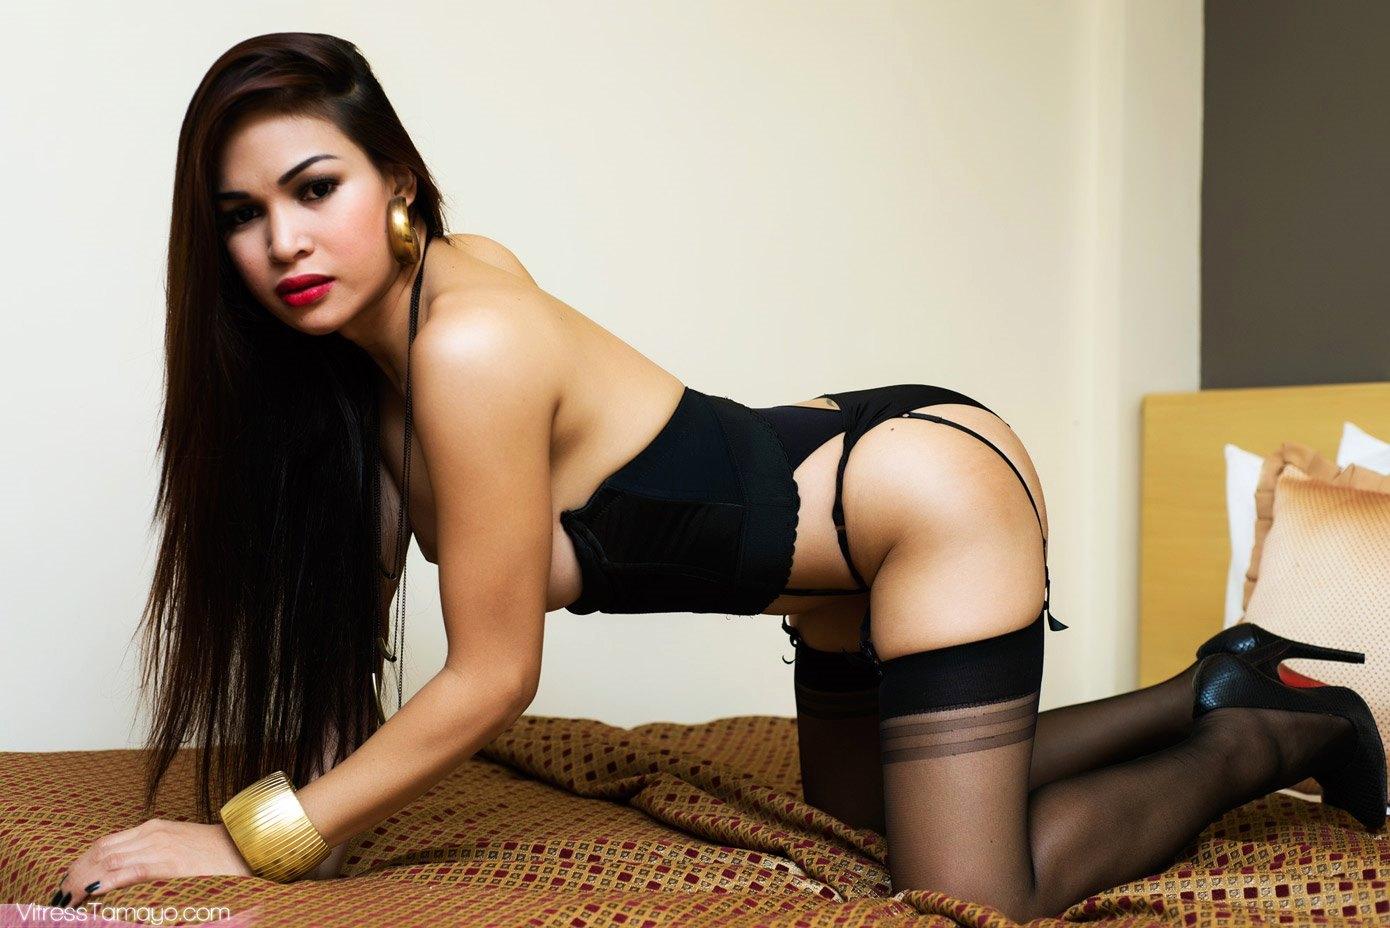 Glamorous TS Vitress Tamayo Taking Off Her Panties And Stockings